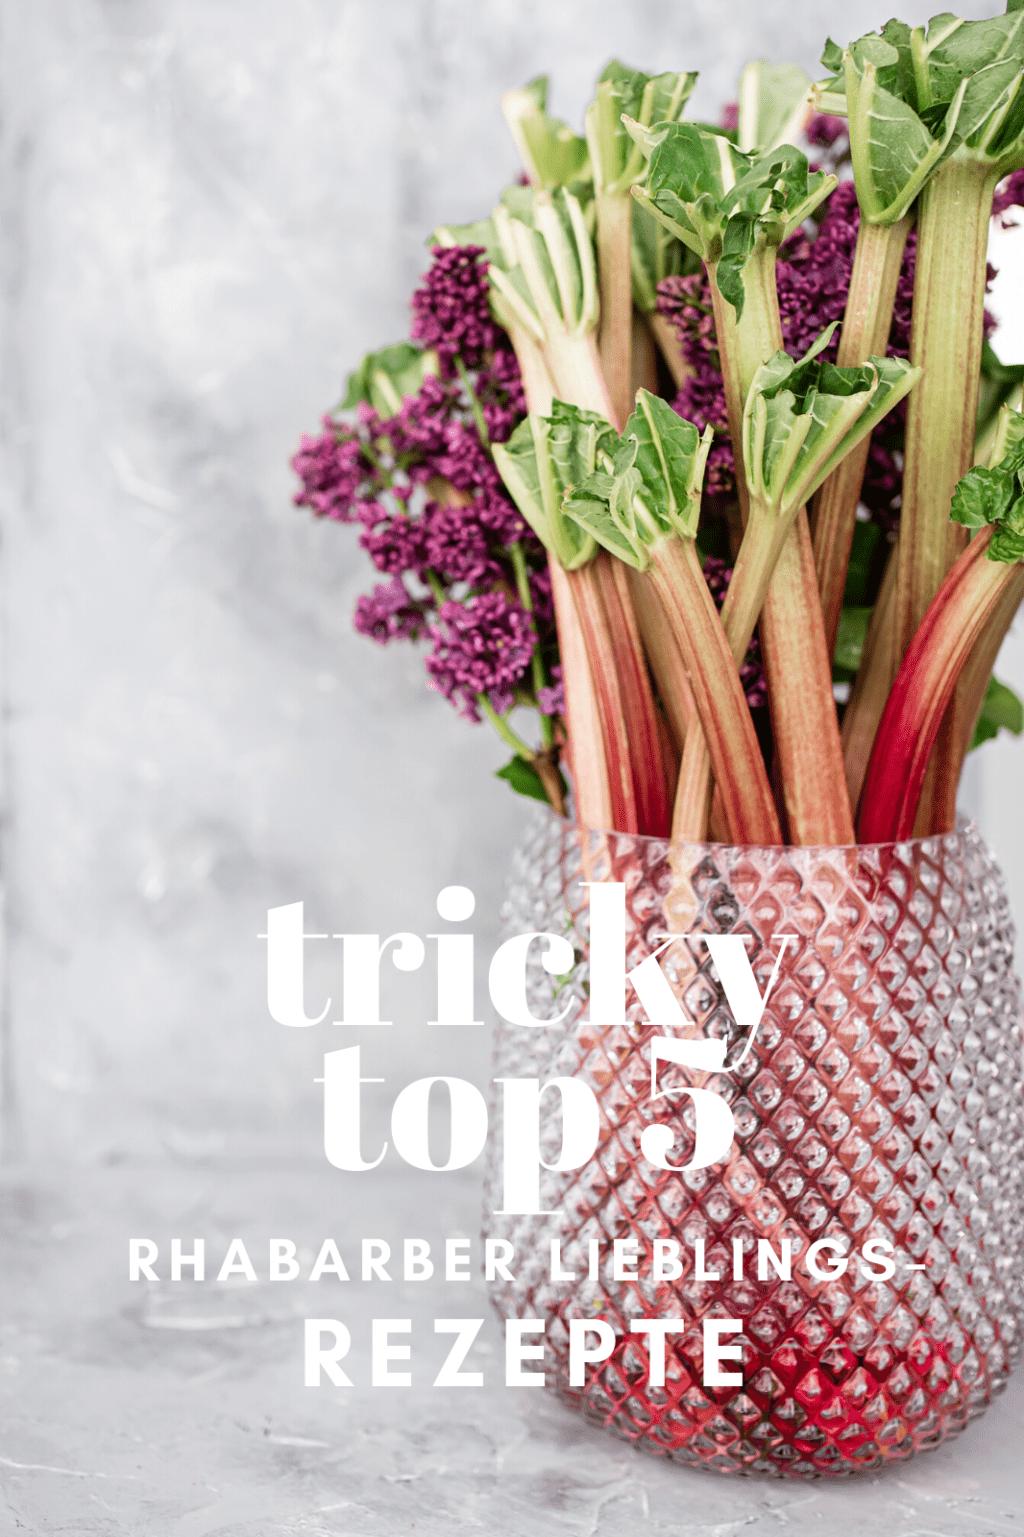 Rhabarber 5 Lieblingsrezepte Foodblog trickytine